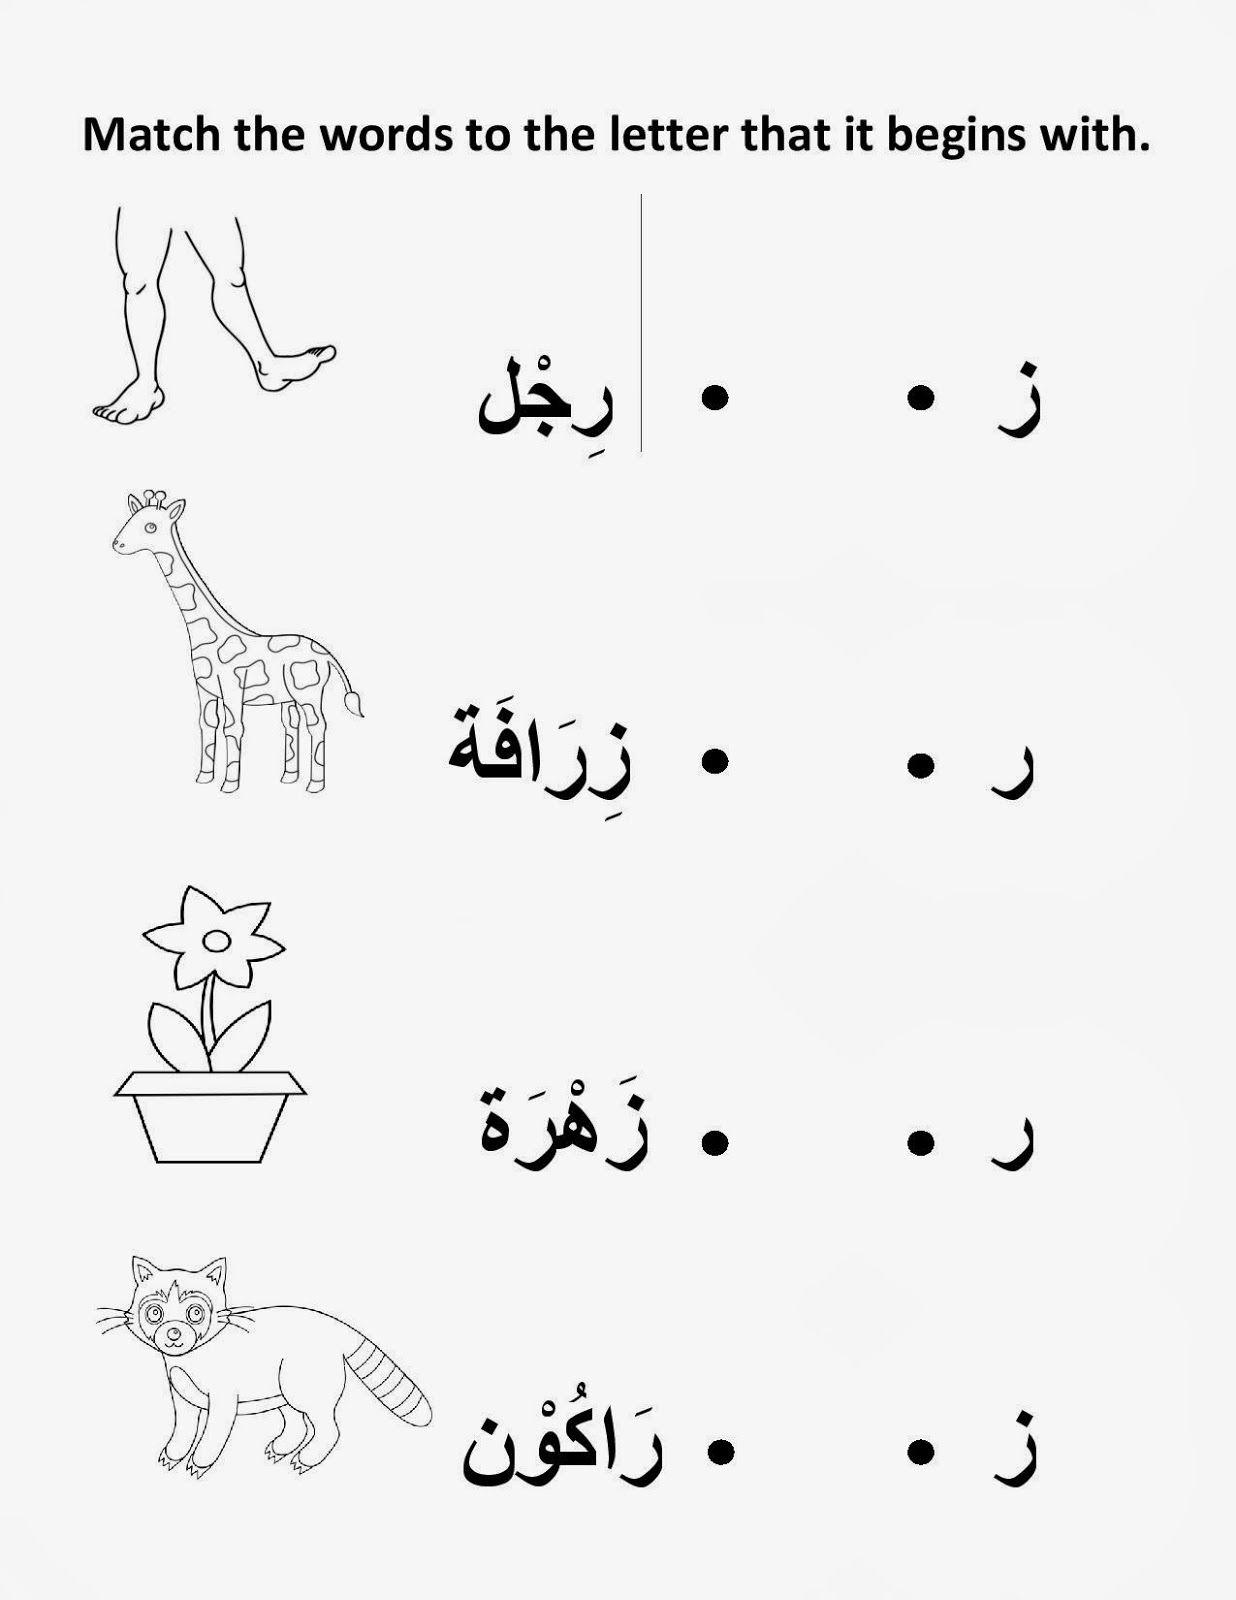 Arabic Letters Worksheet For Kids Arabic Alphabet For Kids Arabic Worksheets Alphabet Worksheets